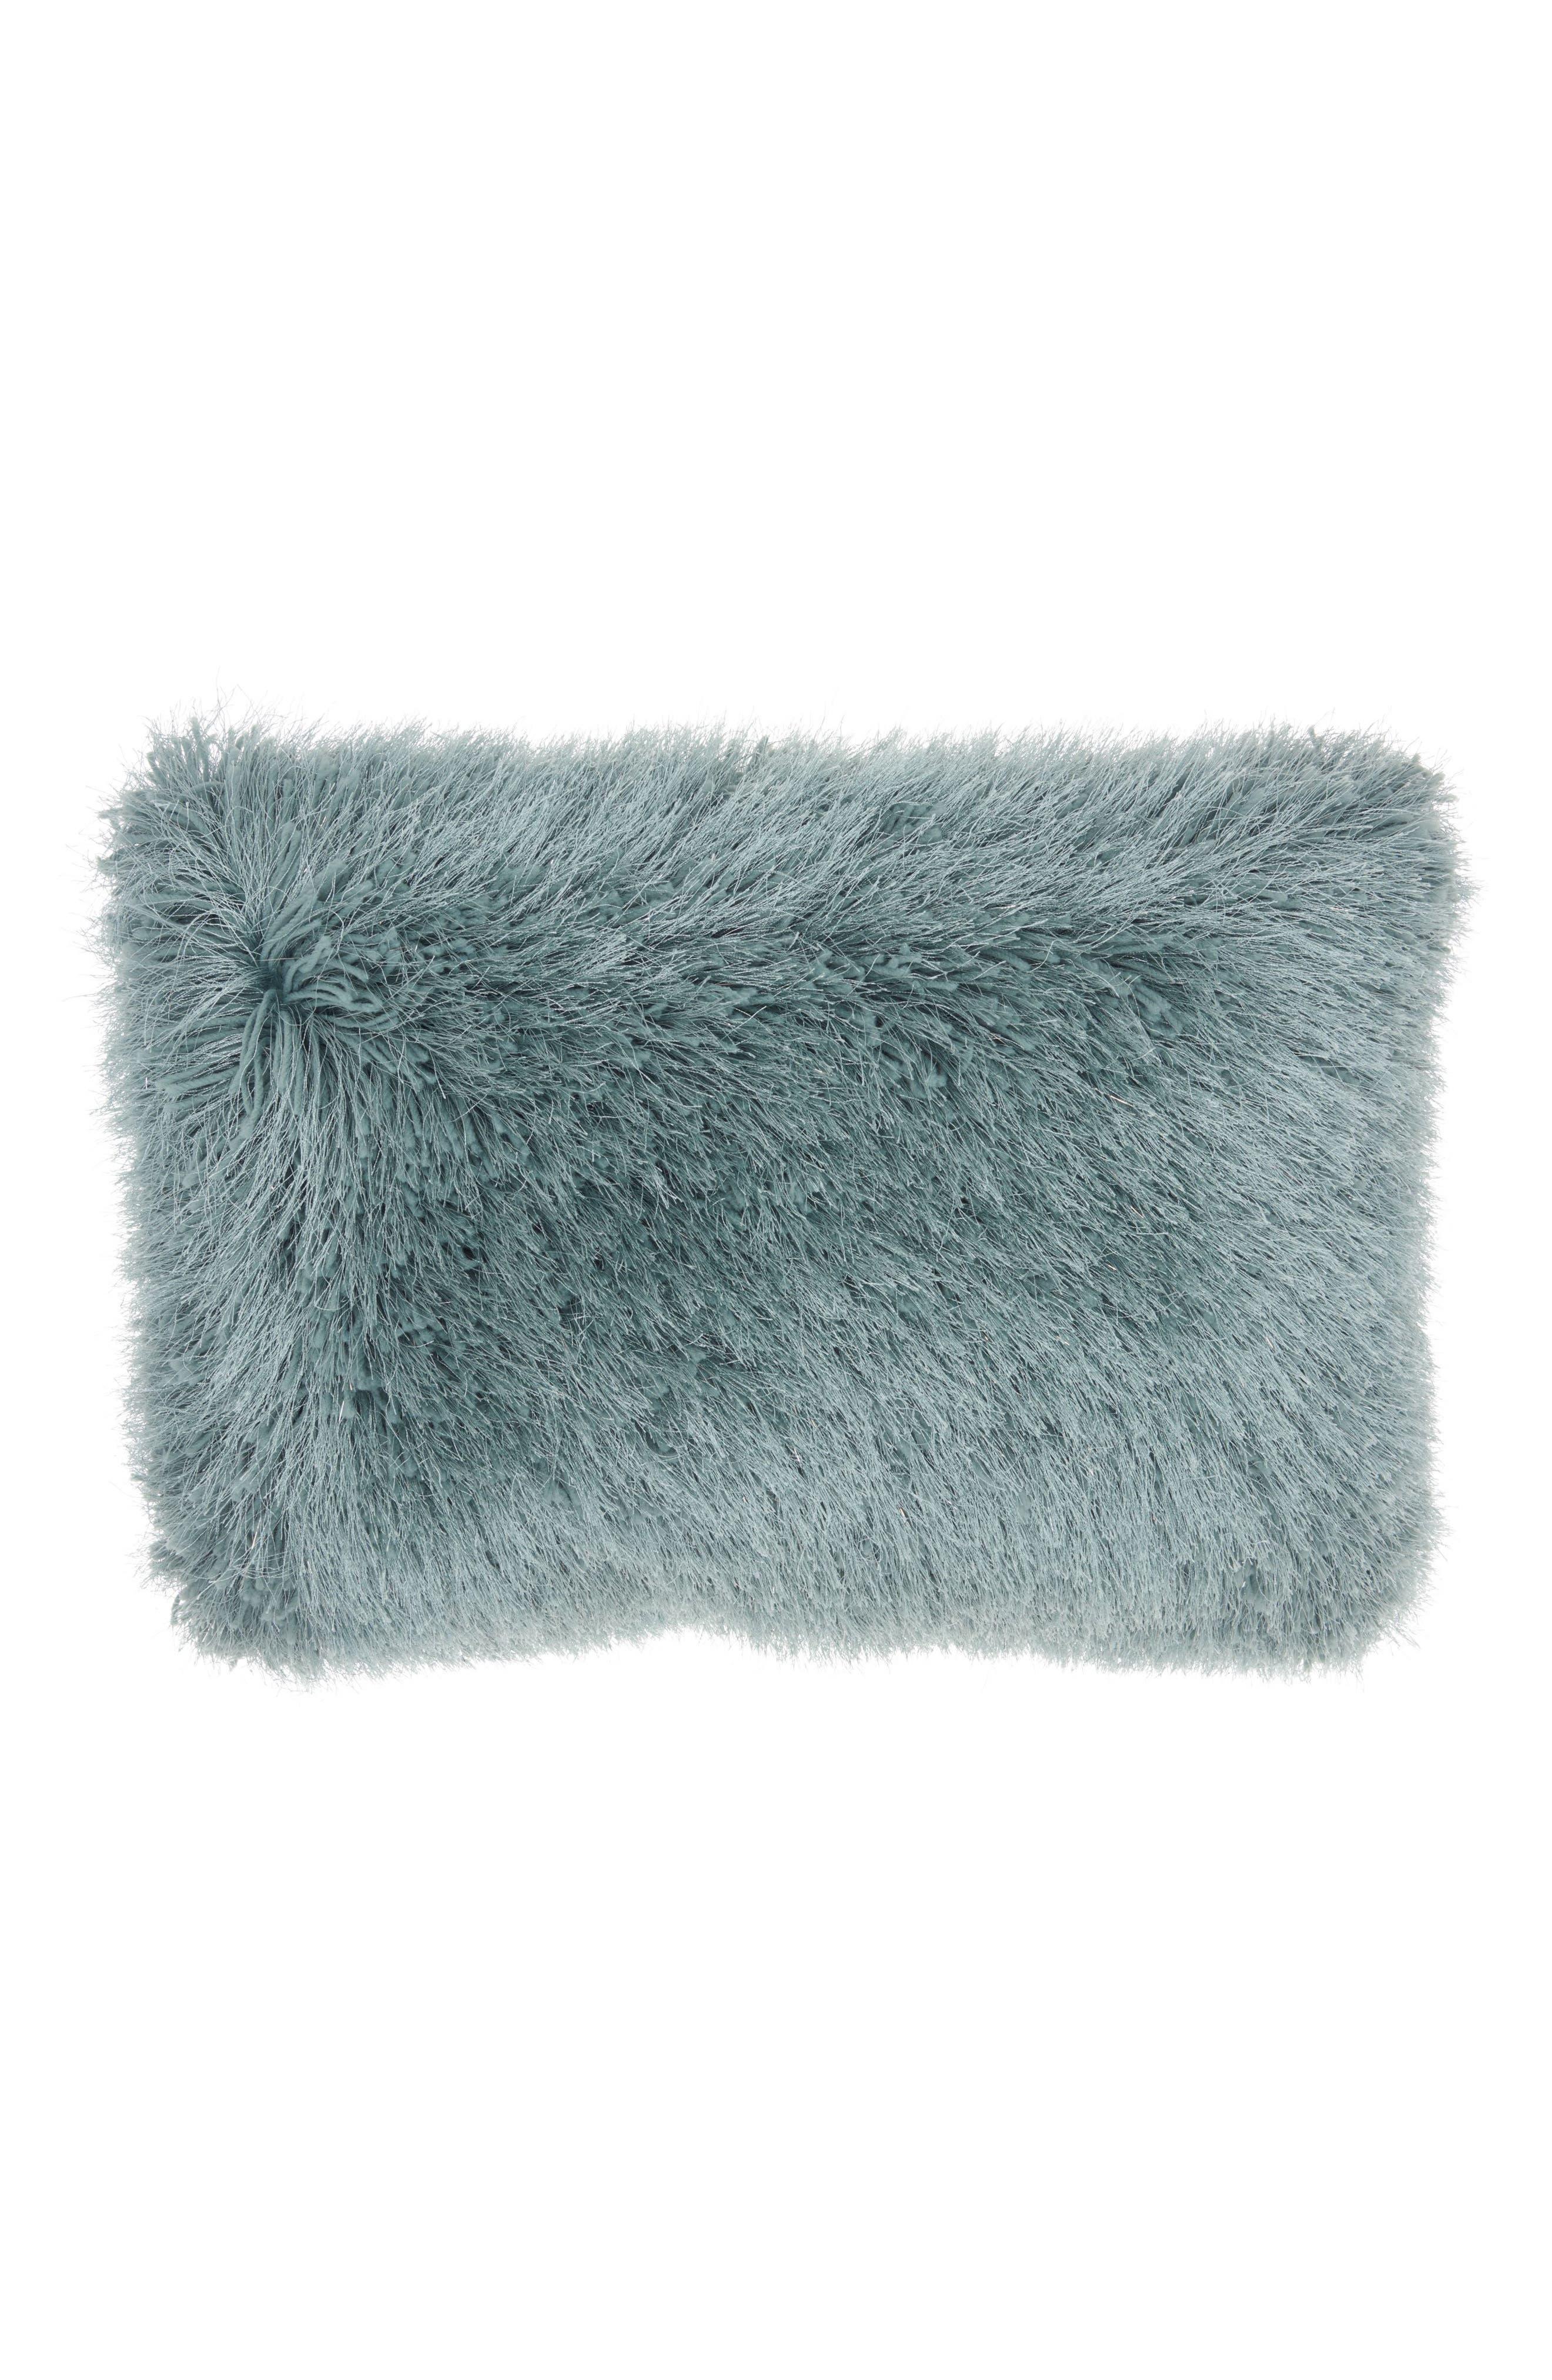 Yarn Shimmer Shag Pillow,                         Main,                         color, 400